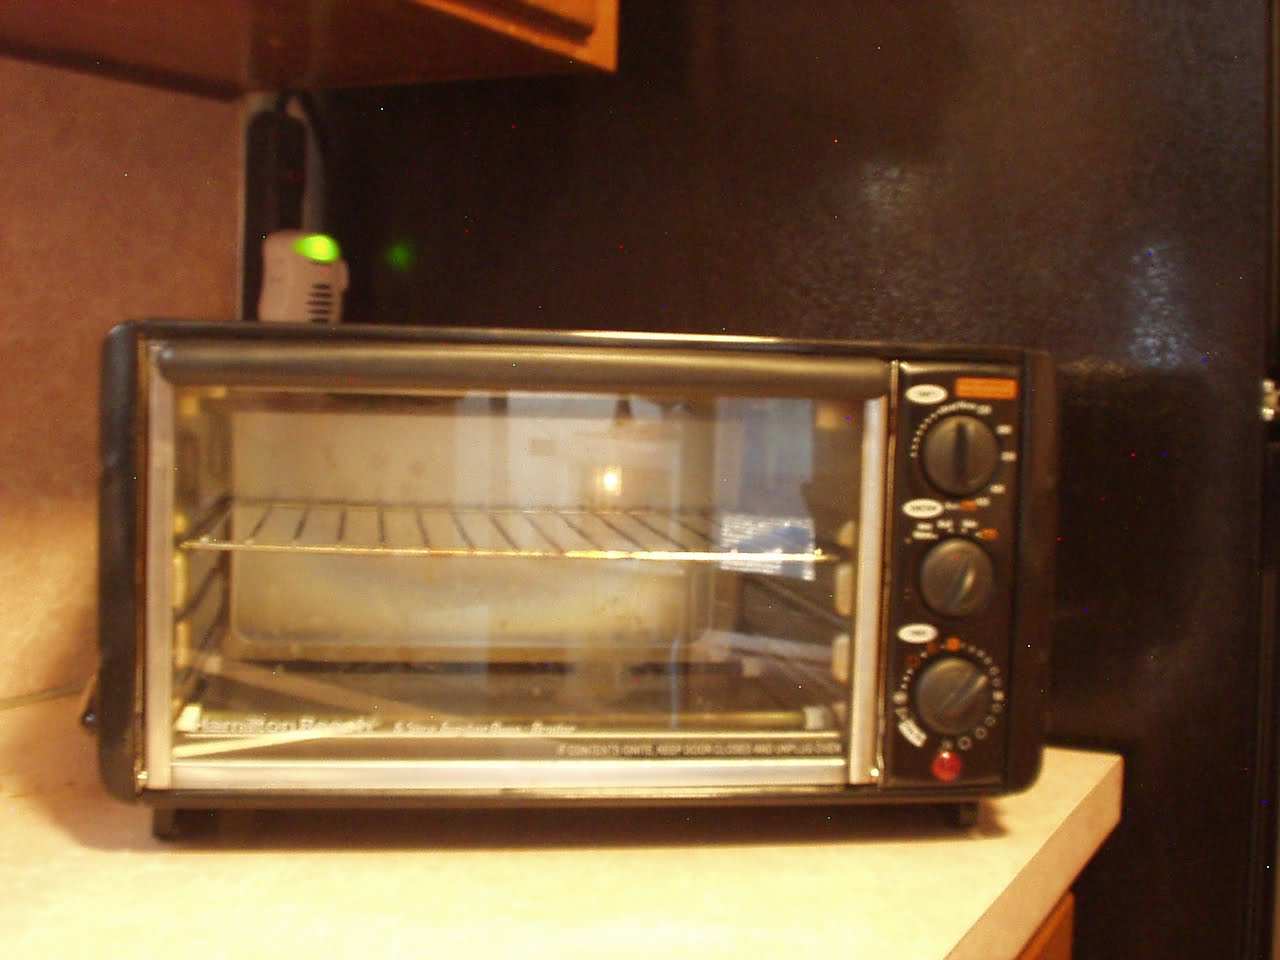 DonsDeals Blog: My Hamilton Beach 31160b Toaster Oven Timer